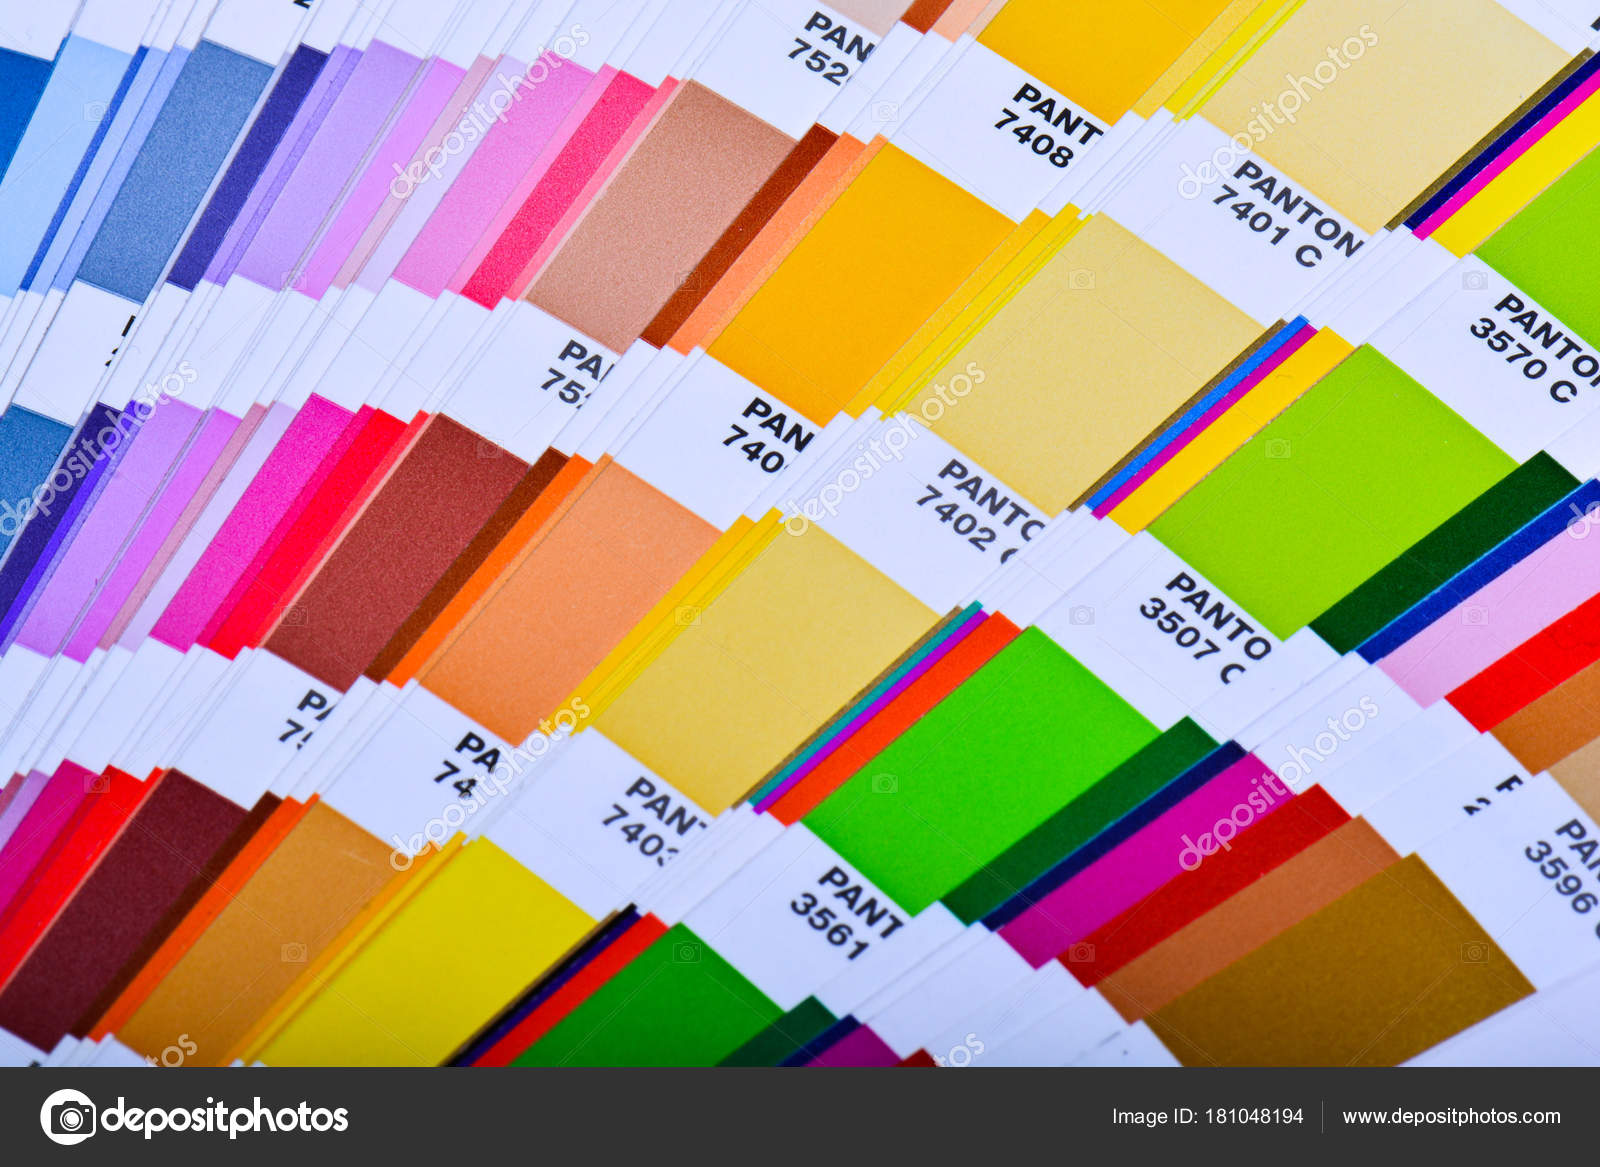 Guía Paleta Colores Cerca Catálogo Swatch Colores — Fotos de Stock ...